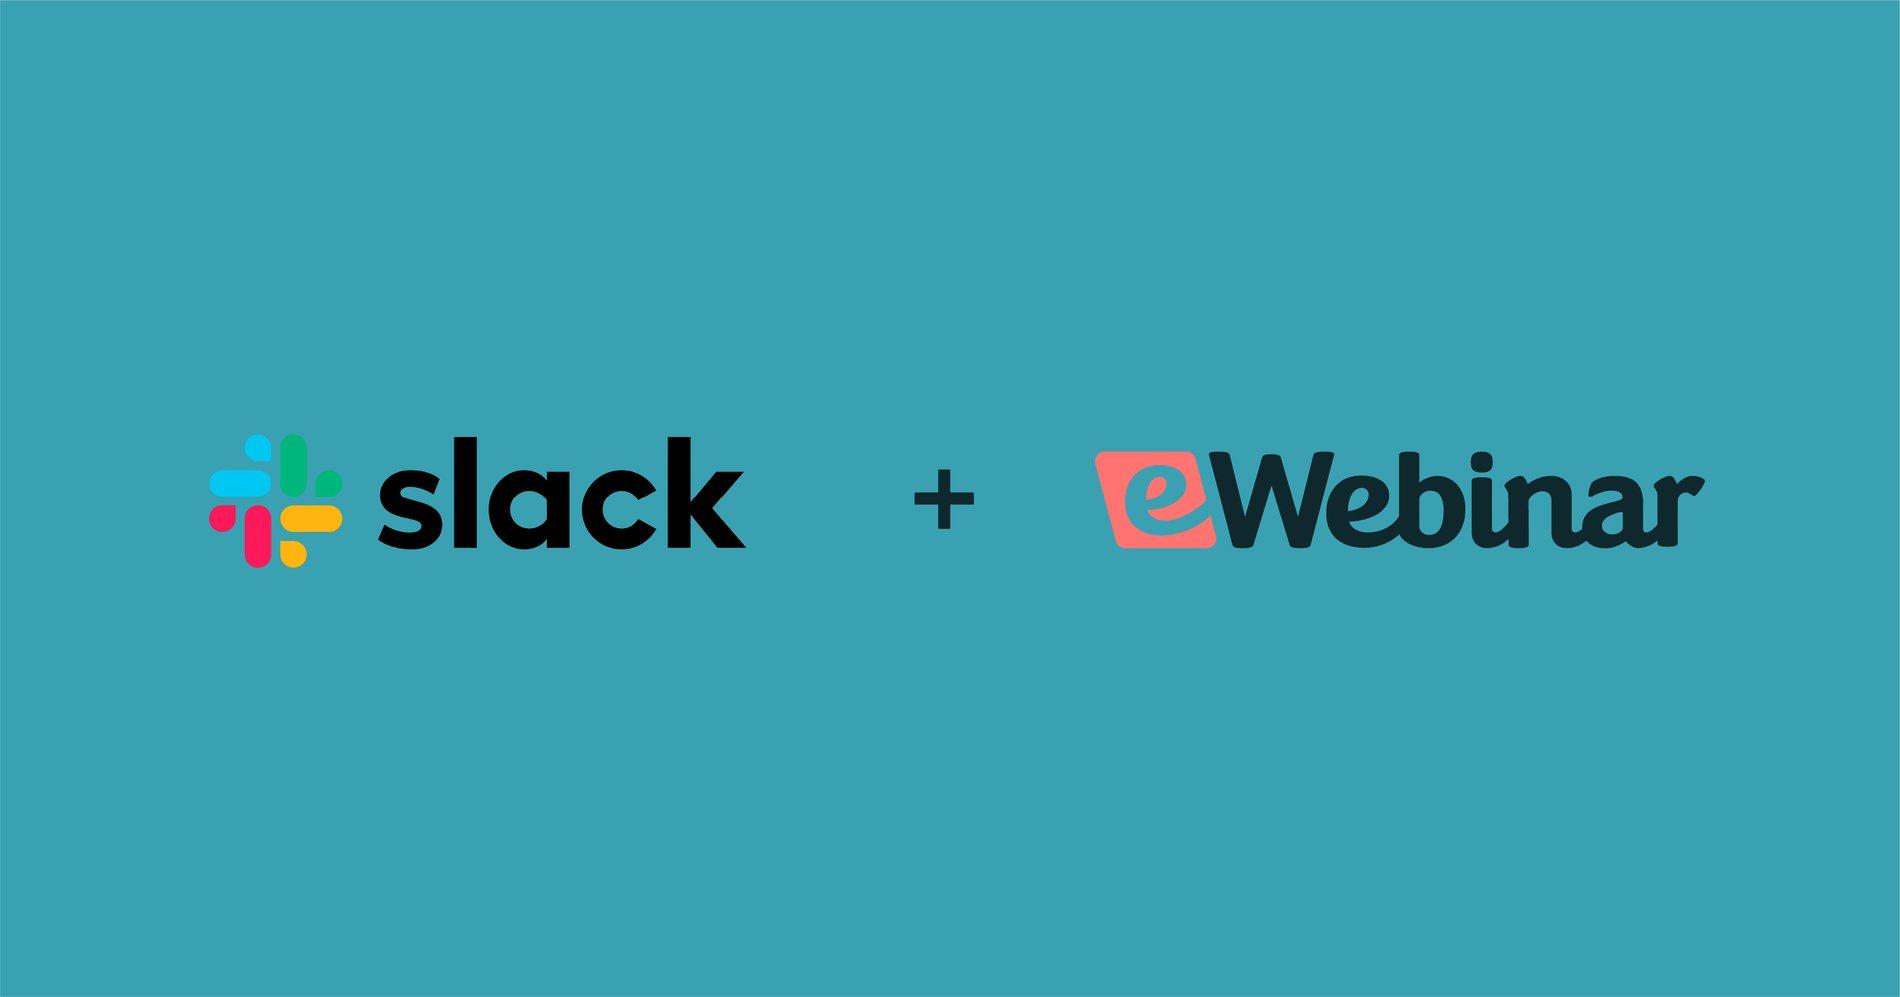 eWebinar Integrates with Slack